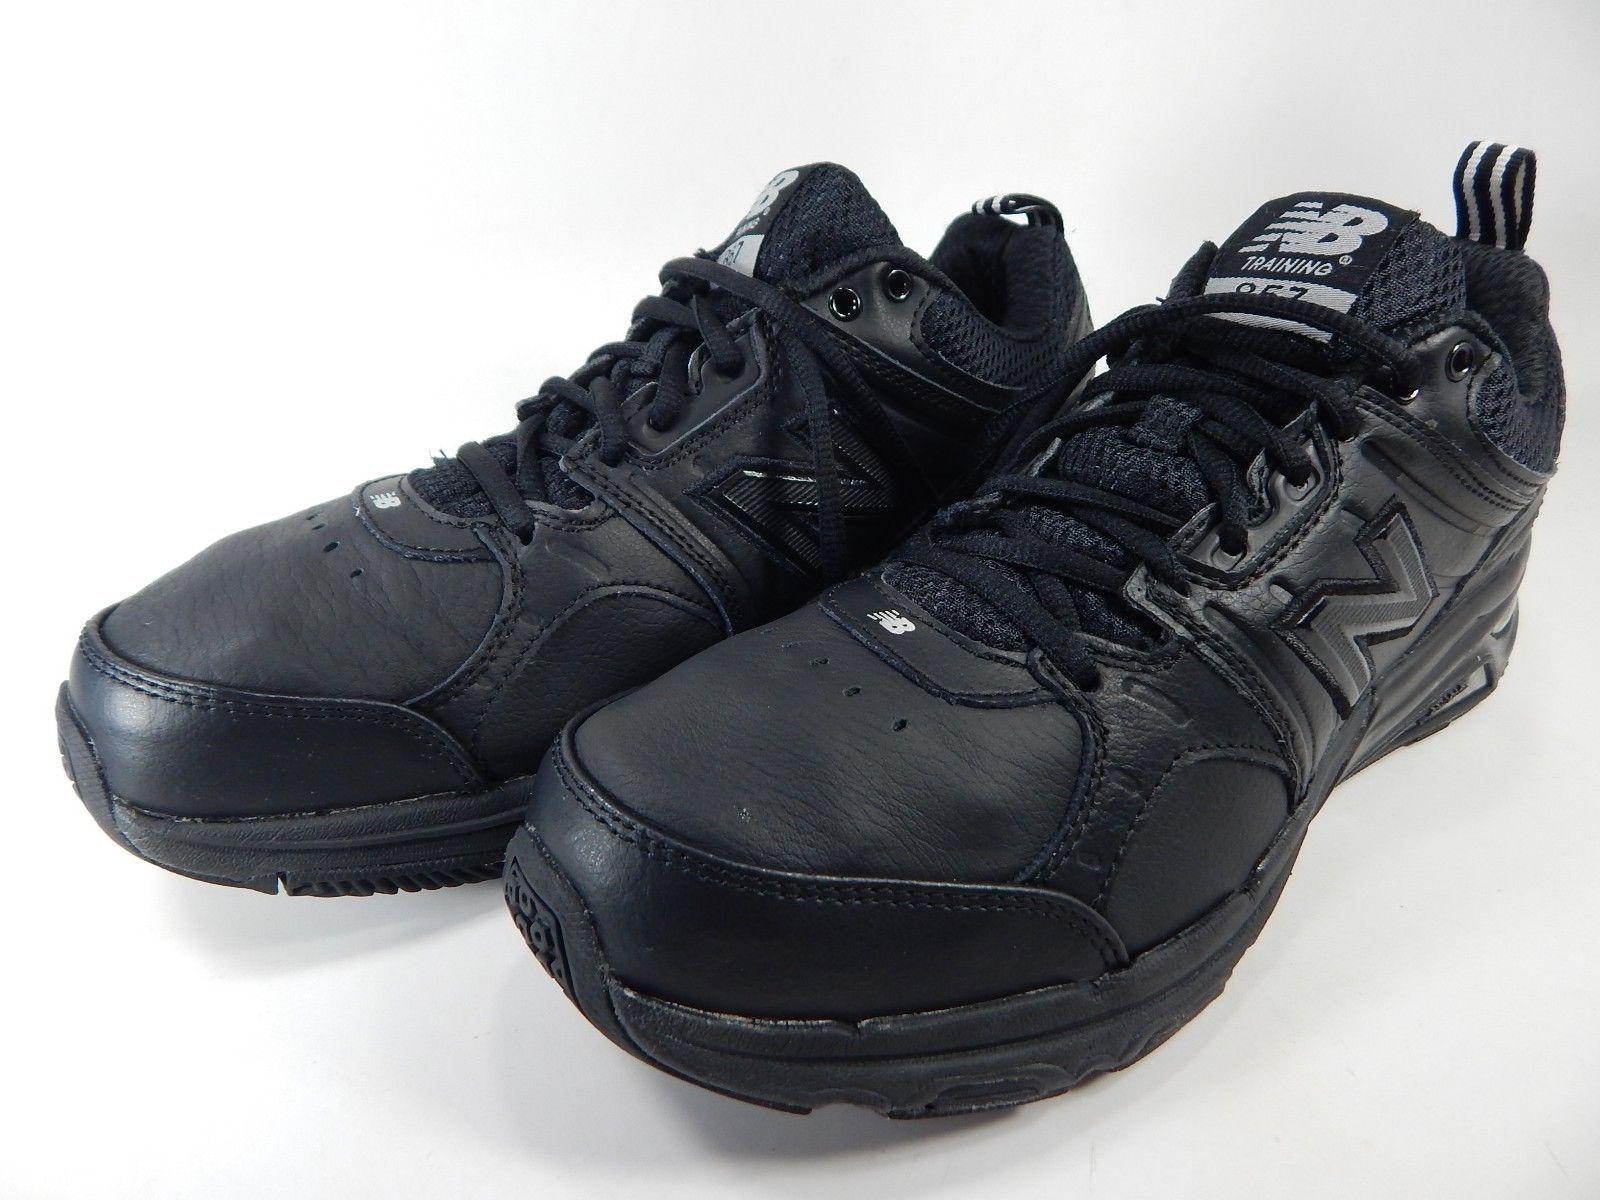 New Balance 857 Size US 8 M (D) EU 41.5 Men's Cross Training Shoes Black MX857BK